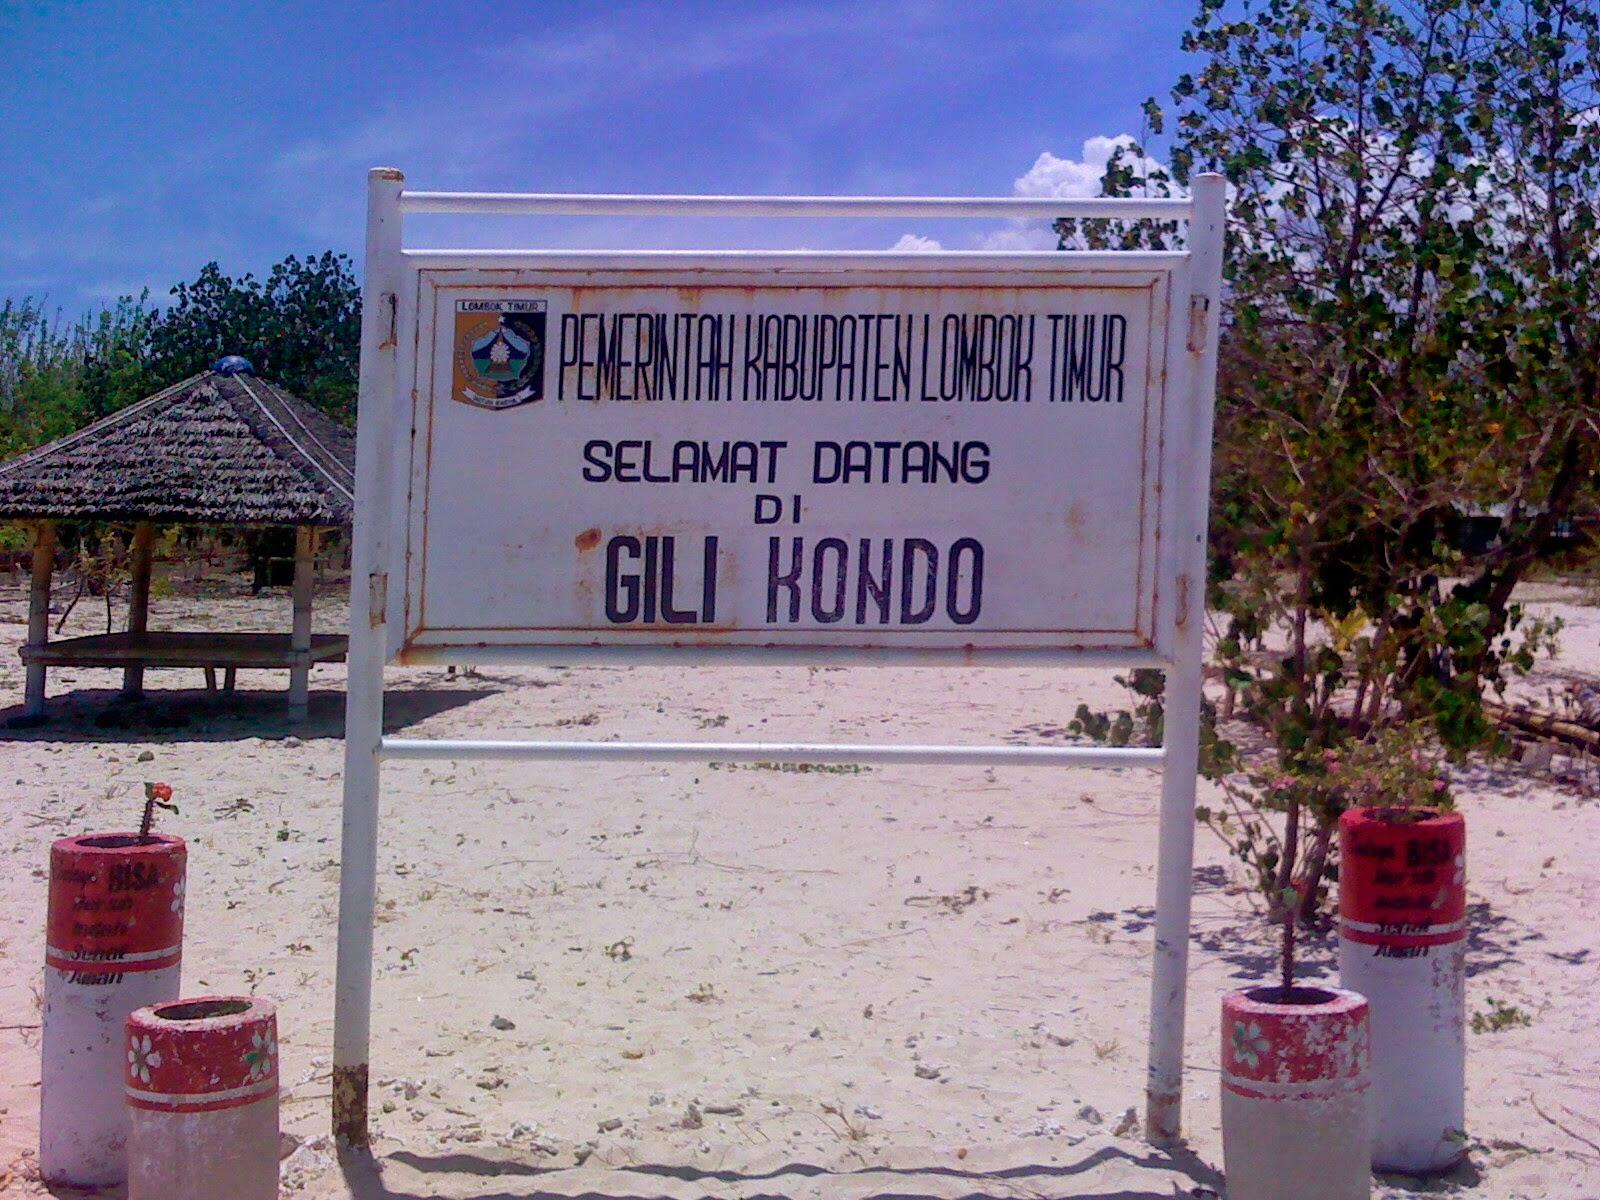 Lokasi Gili Kondo di Lombok Timur